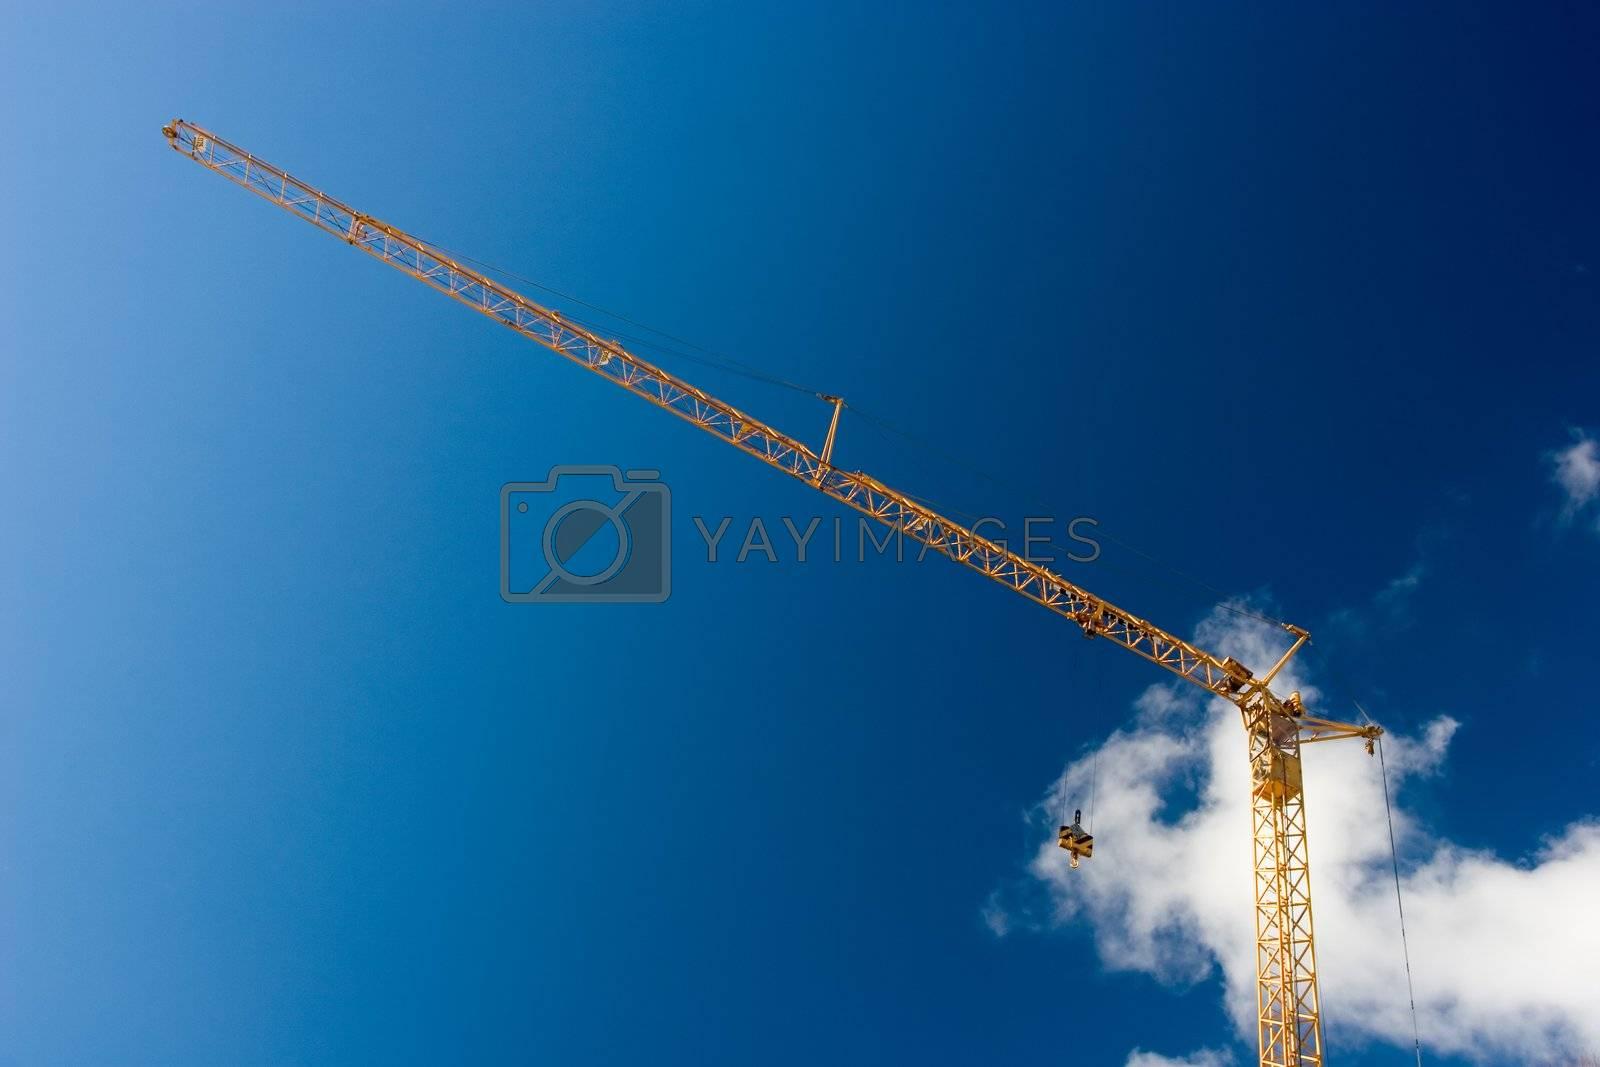 Yellow crane against deep blue sky.